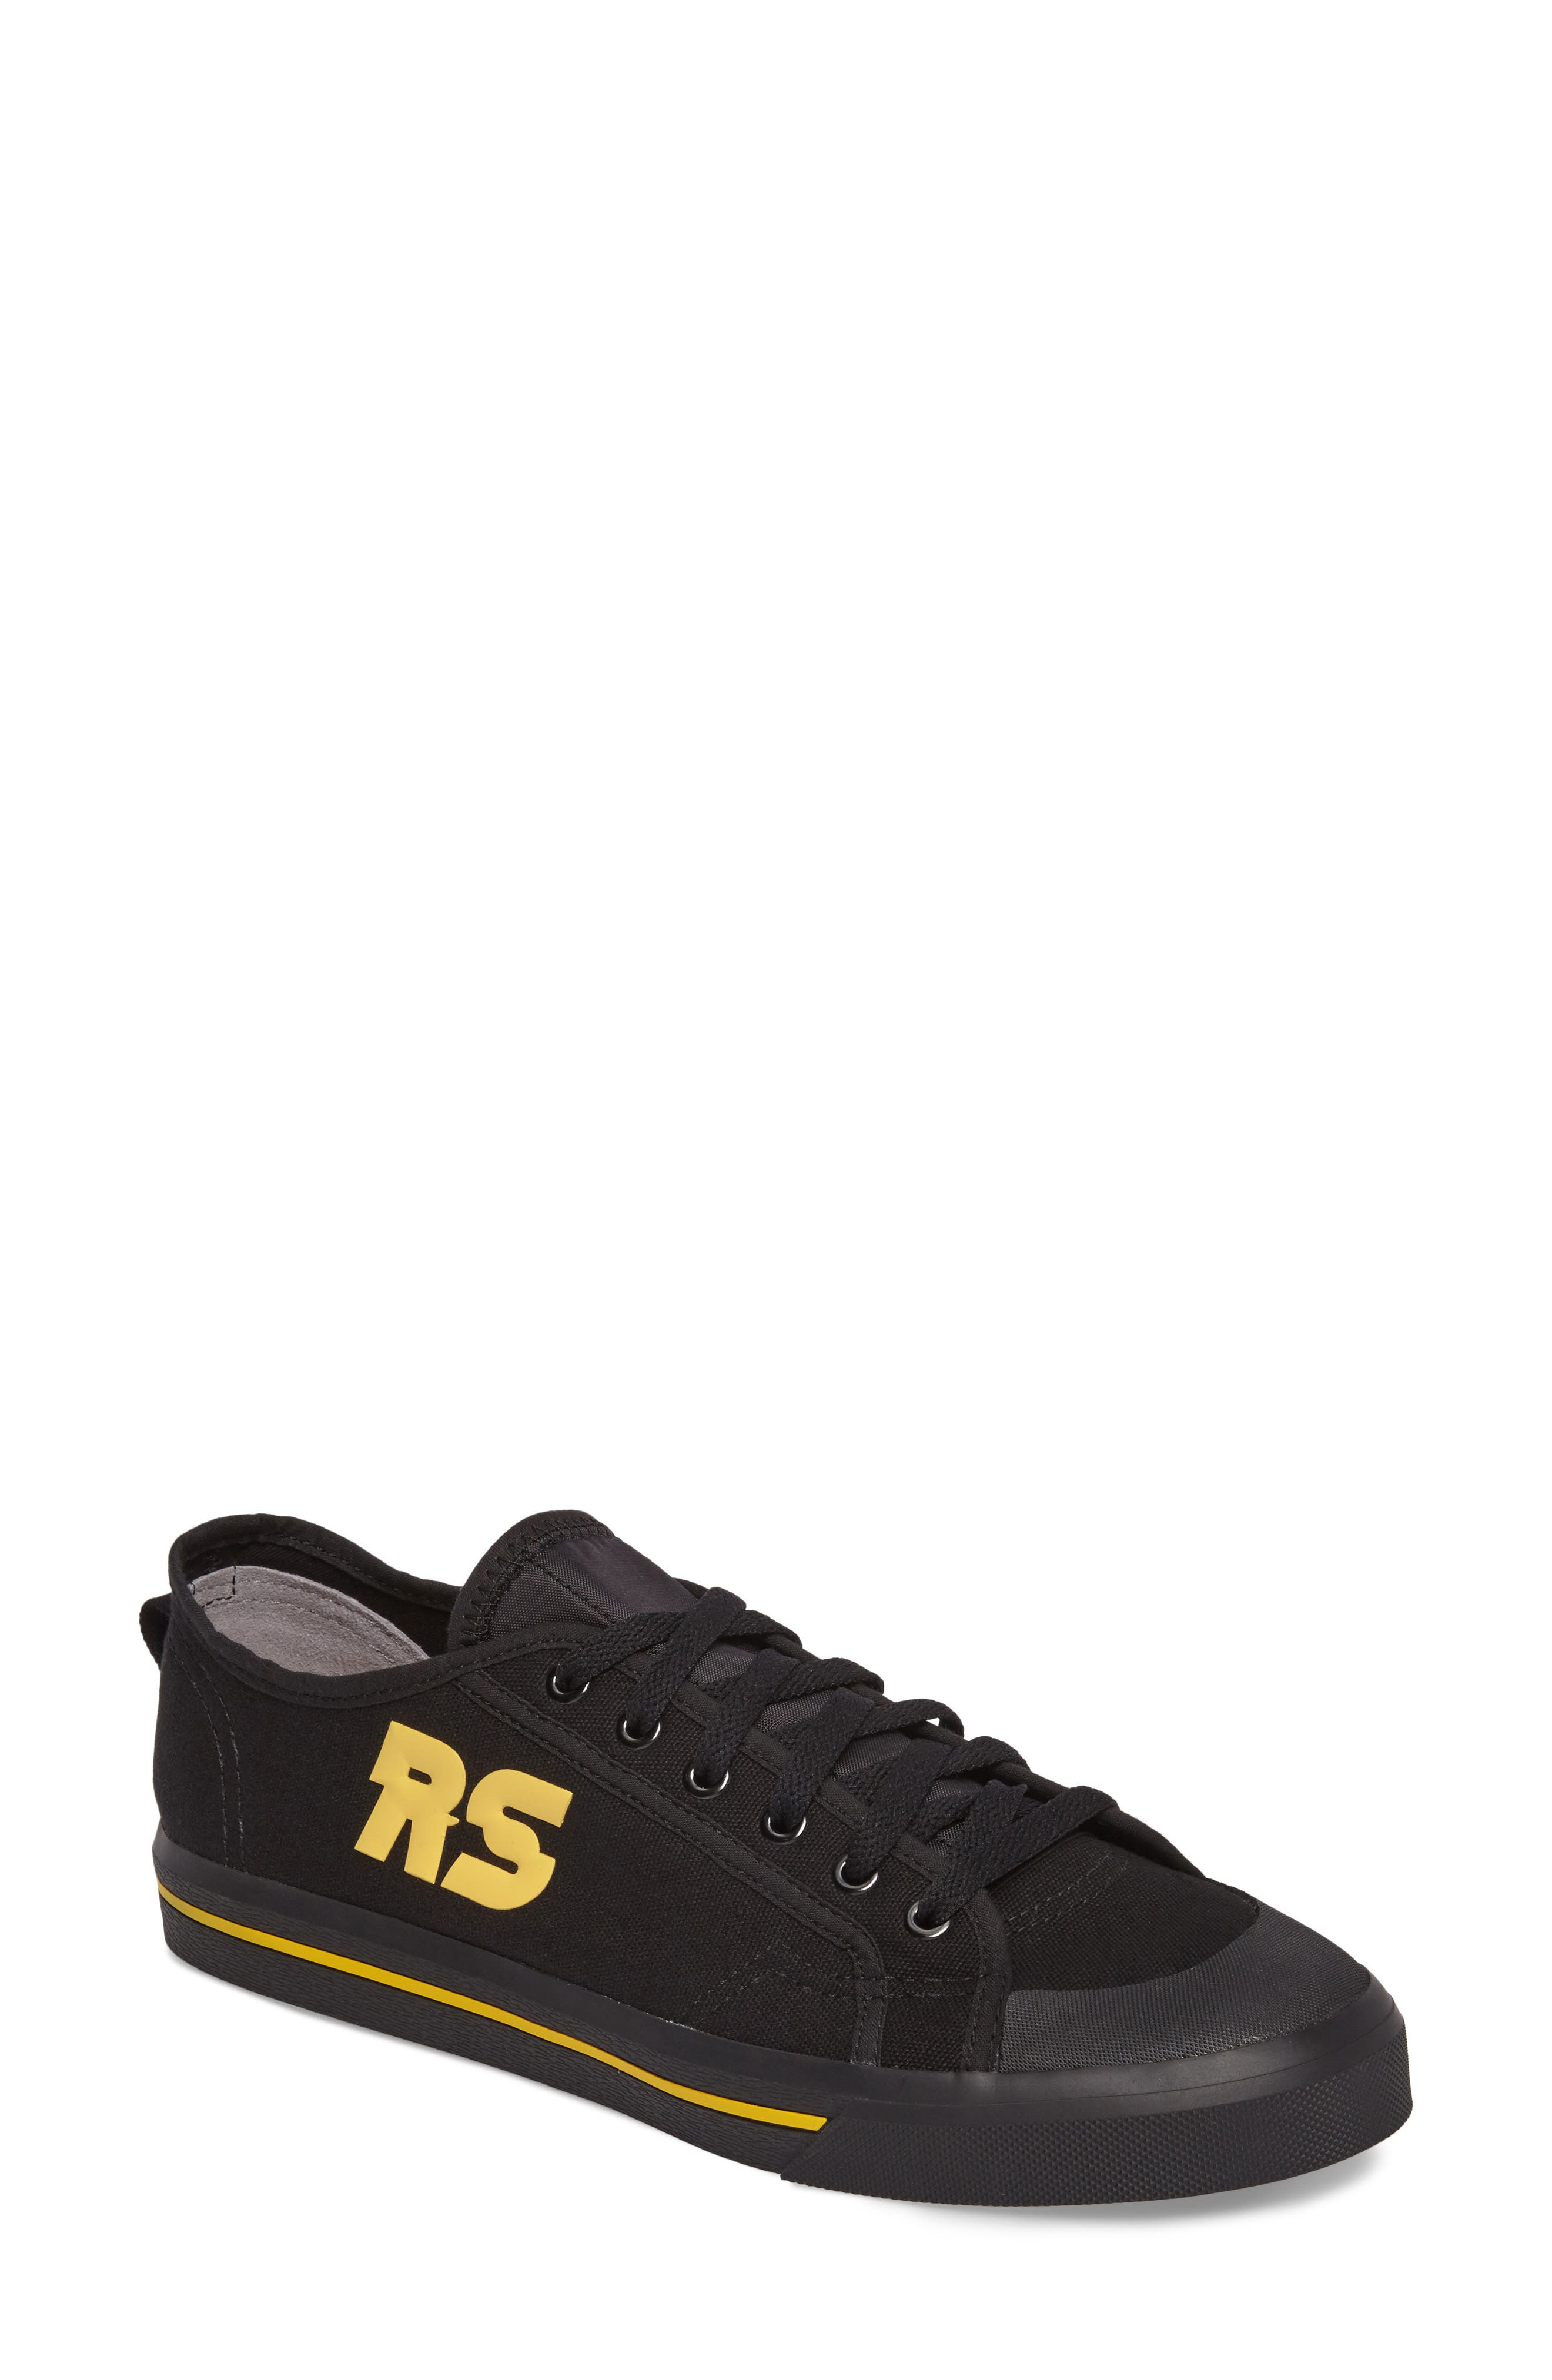 adidas by Raf Simons Spirit Low Top